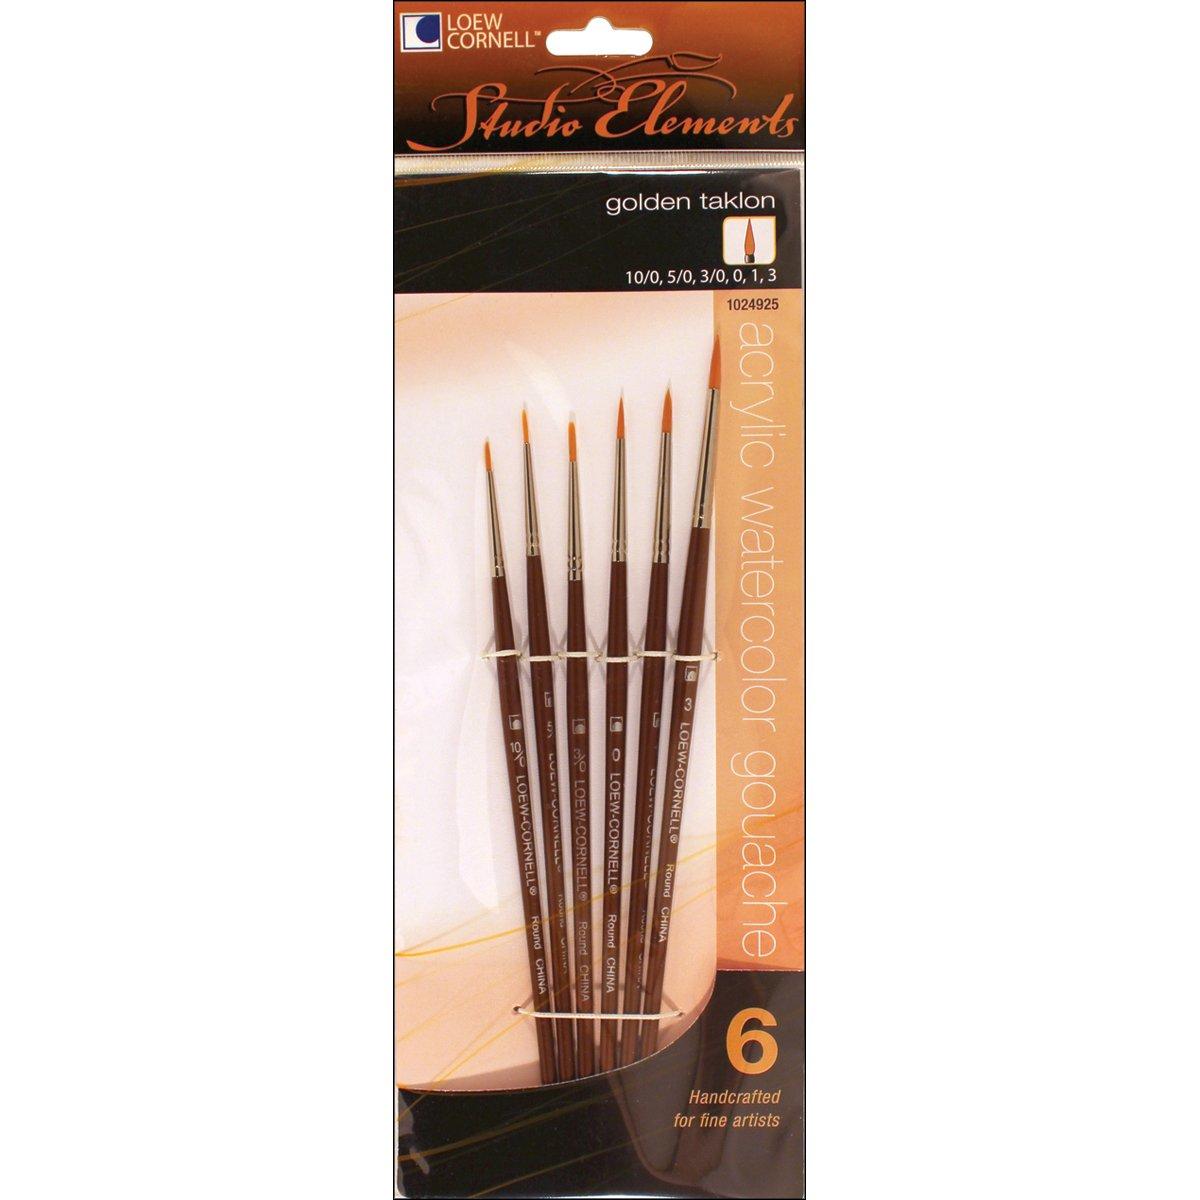 Loew-Cornell 1024925 Studio Elements Golden Taklon Short Handle Round Brush Set Loew Cornell